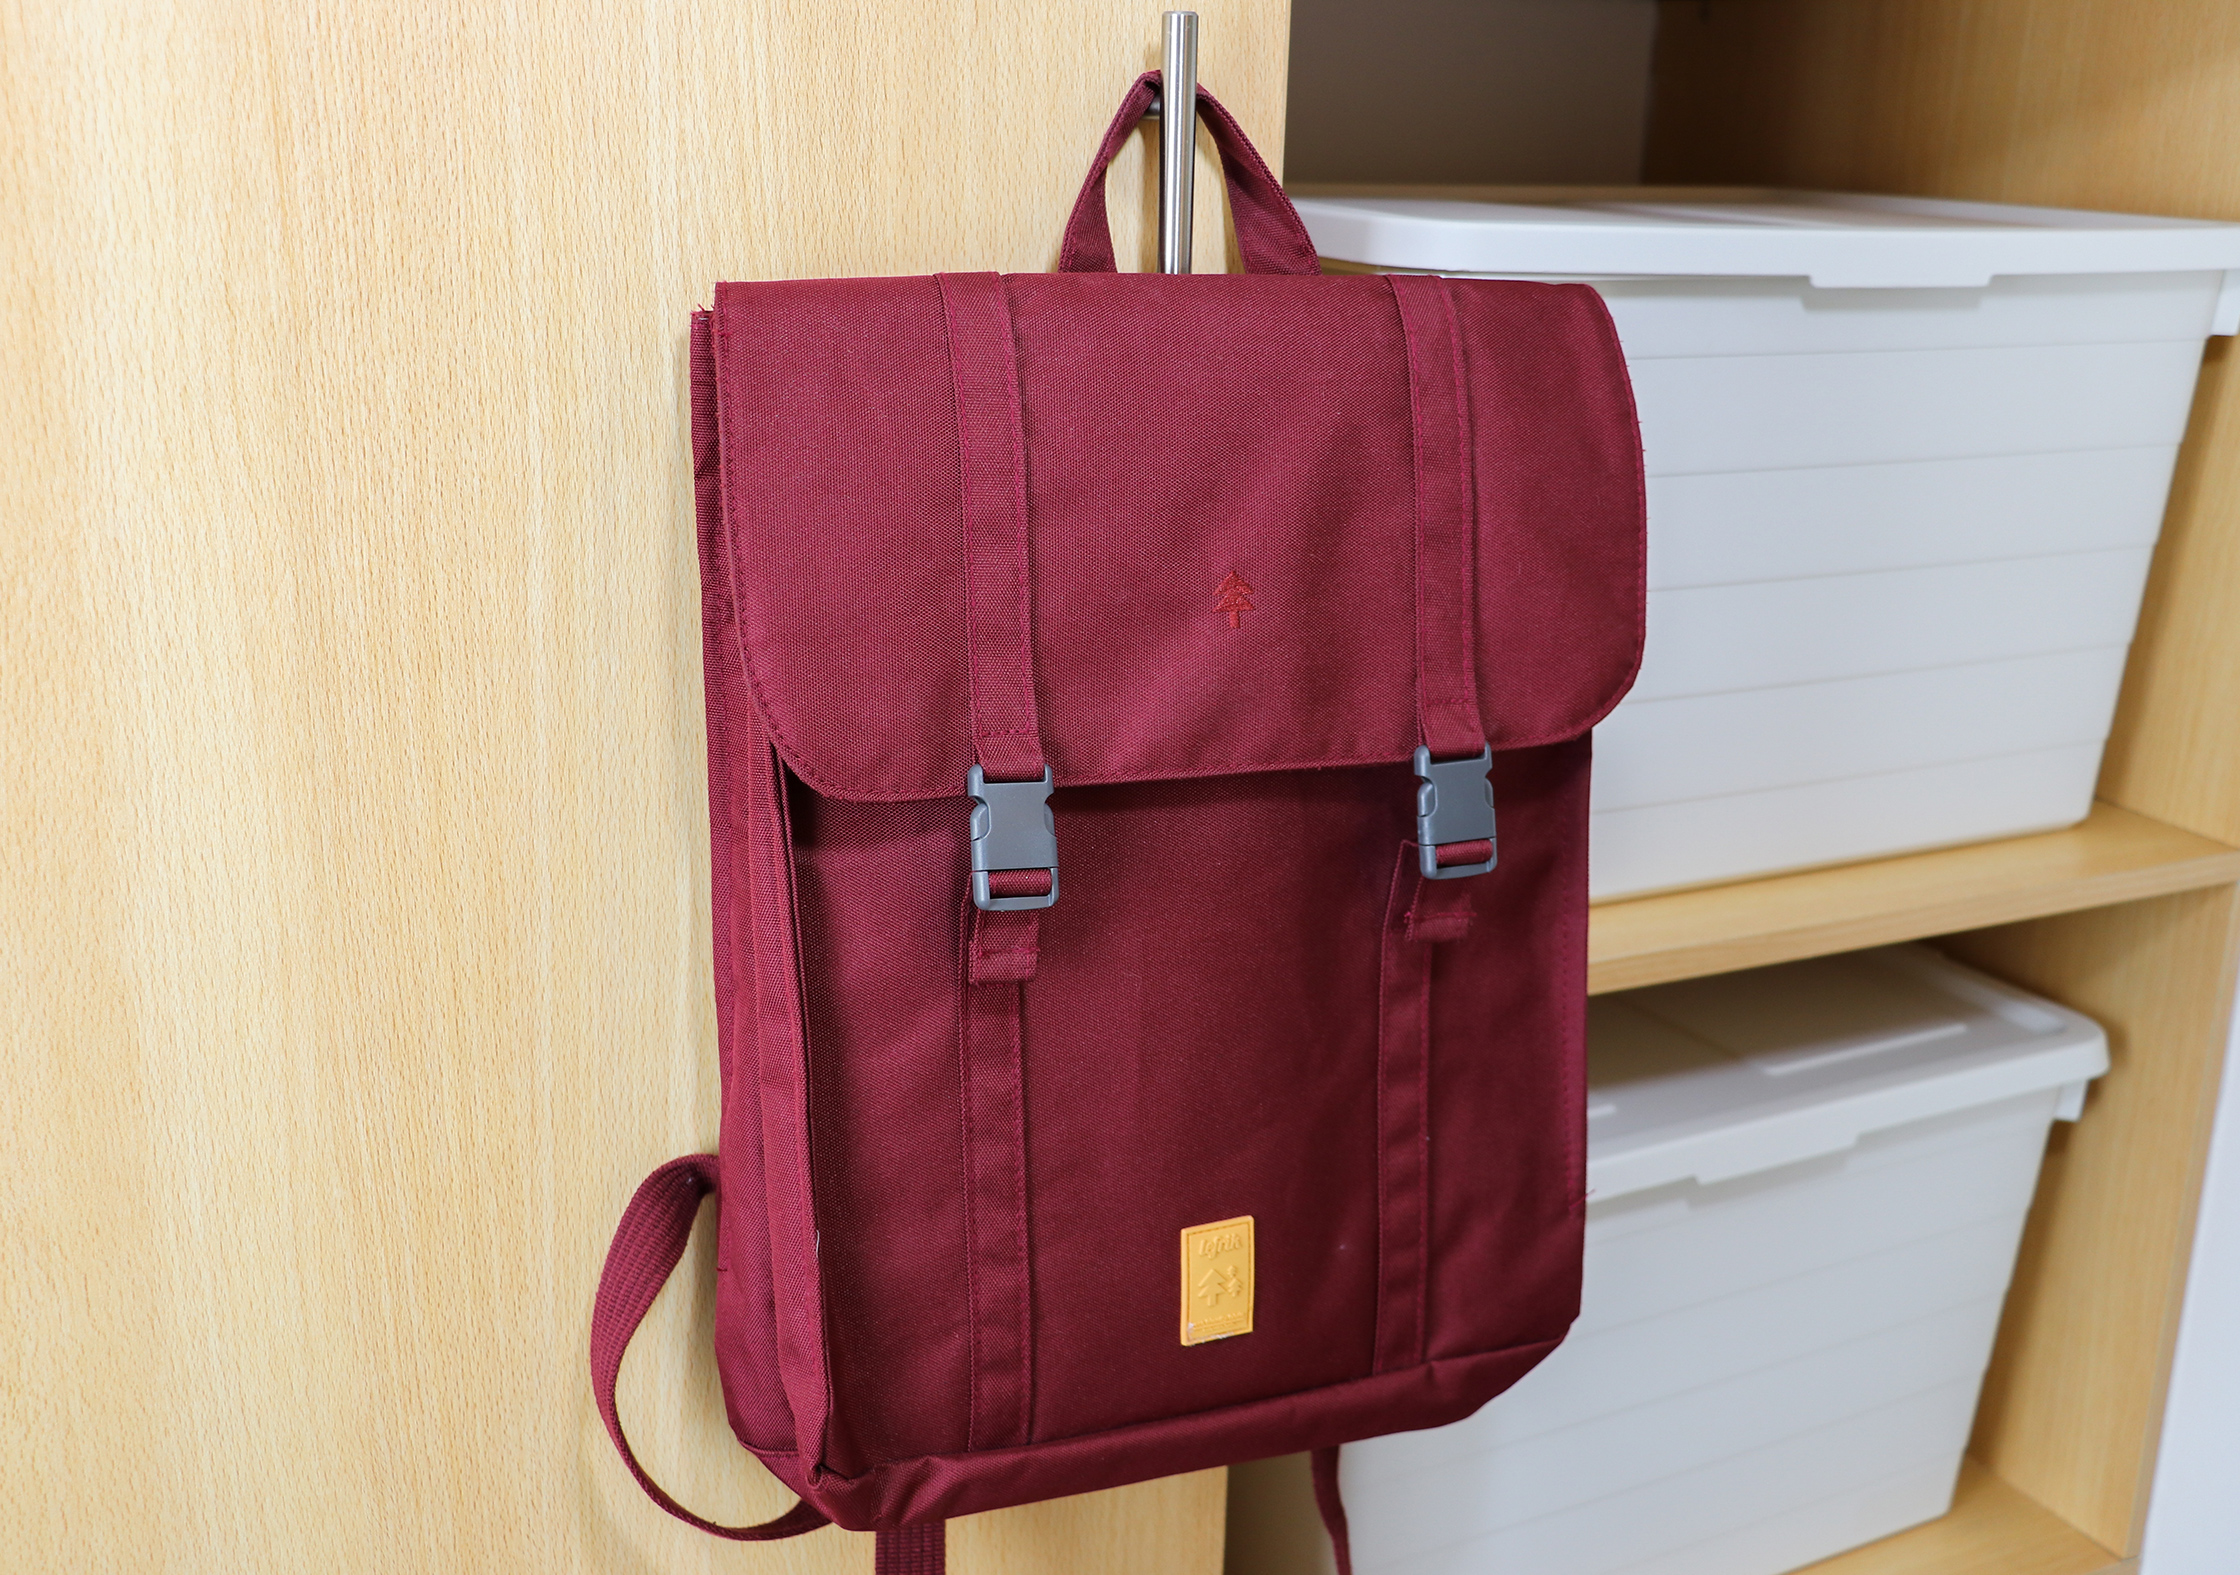 Lefrik Handy Backpack Handle